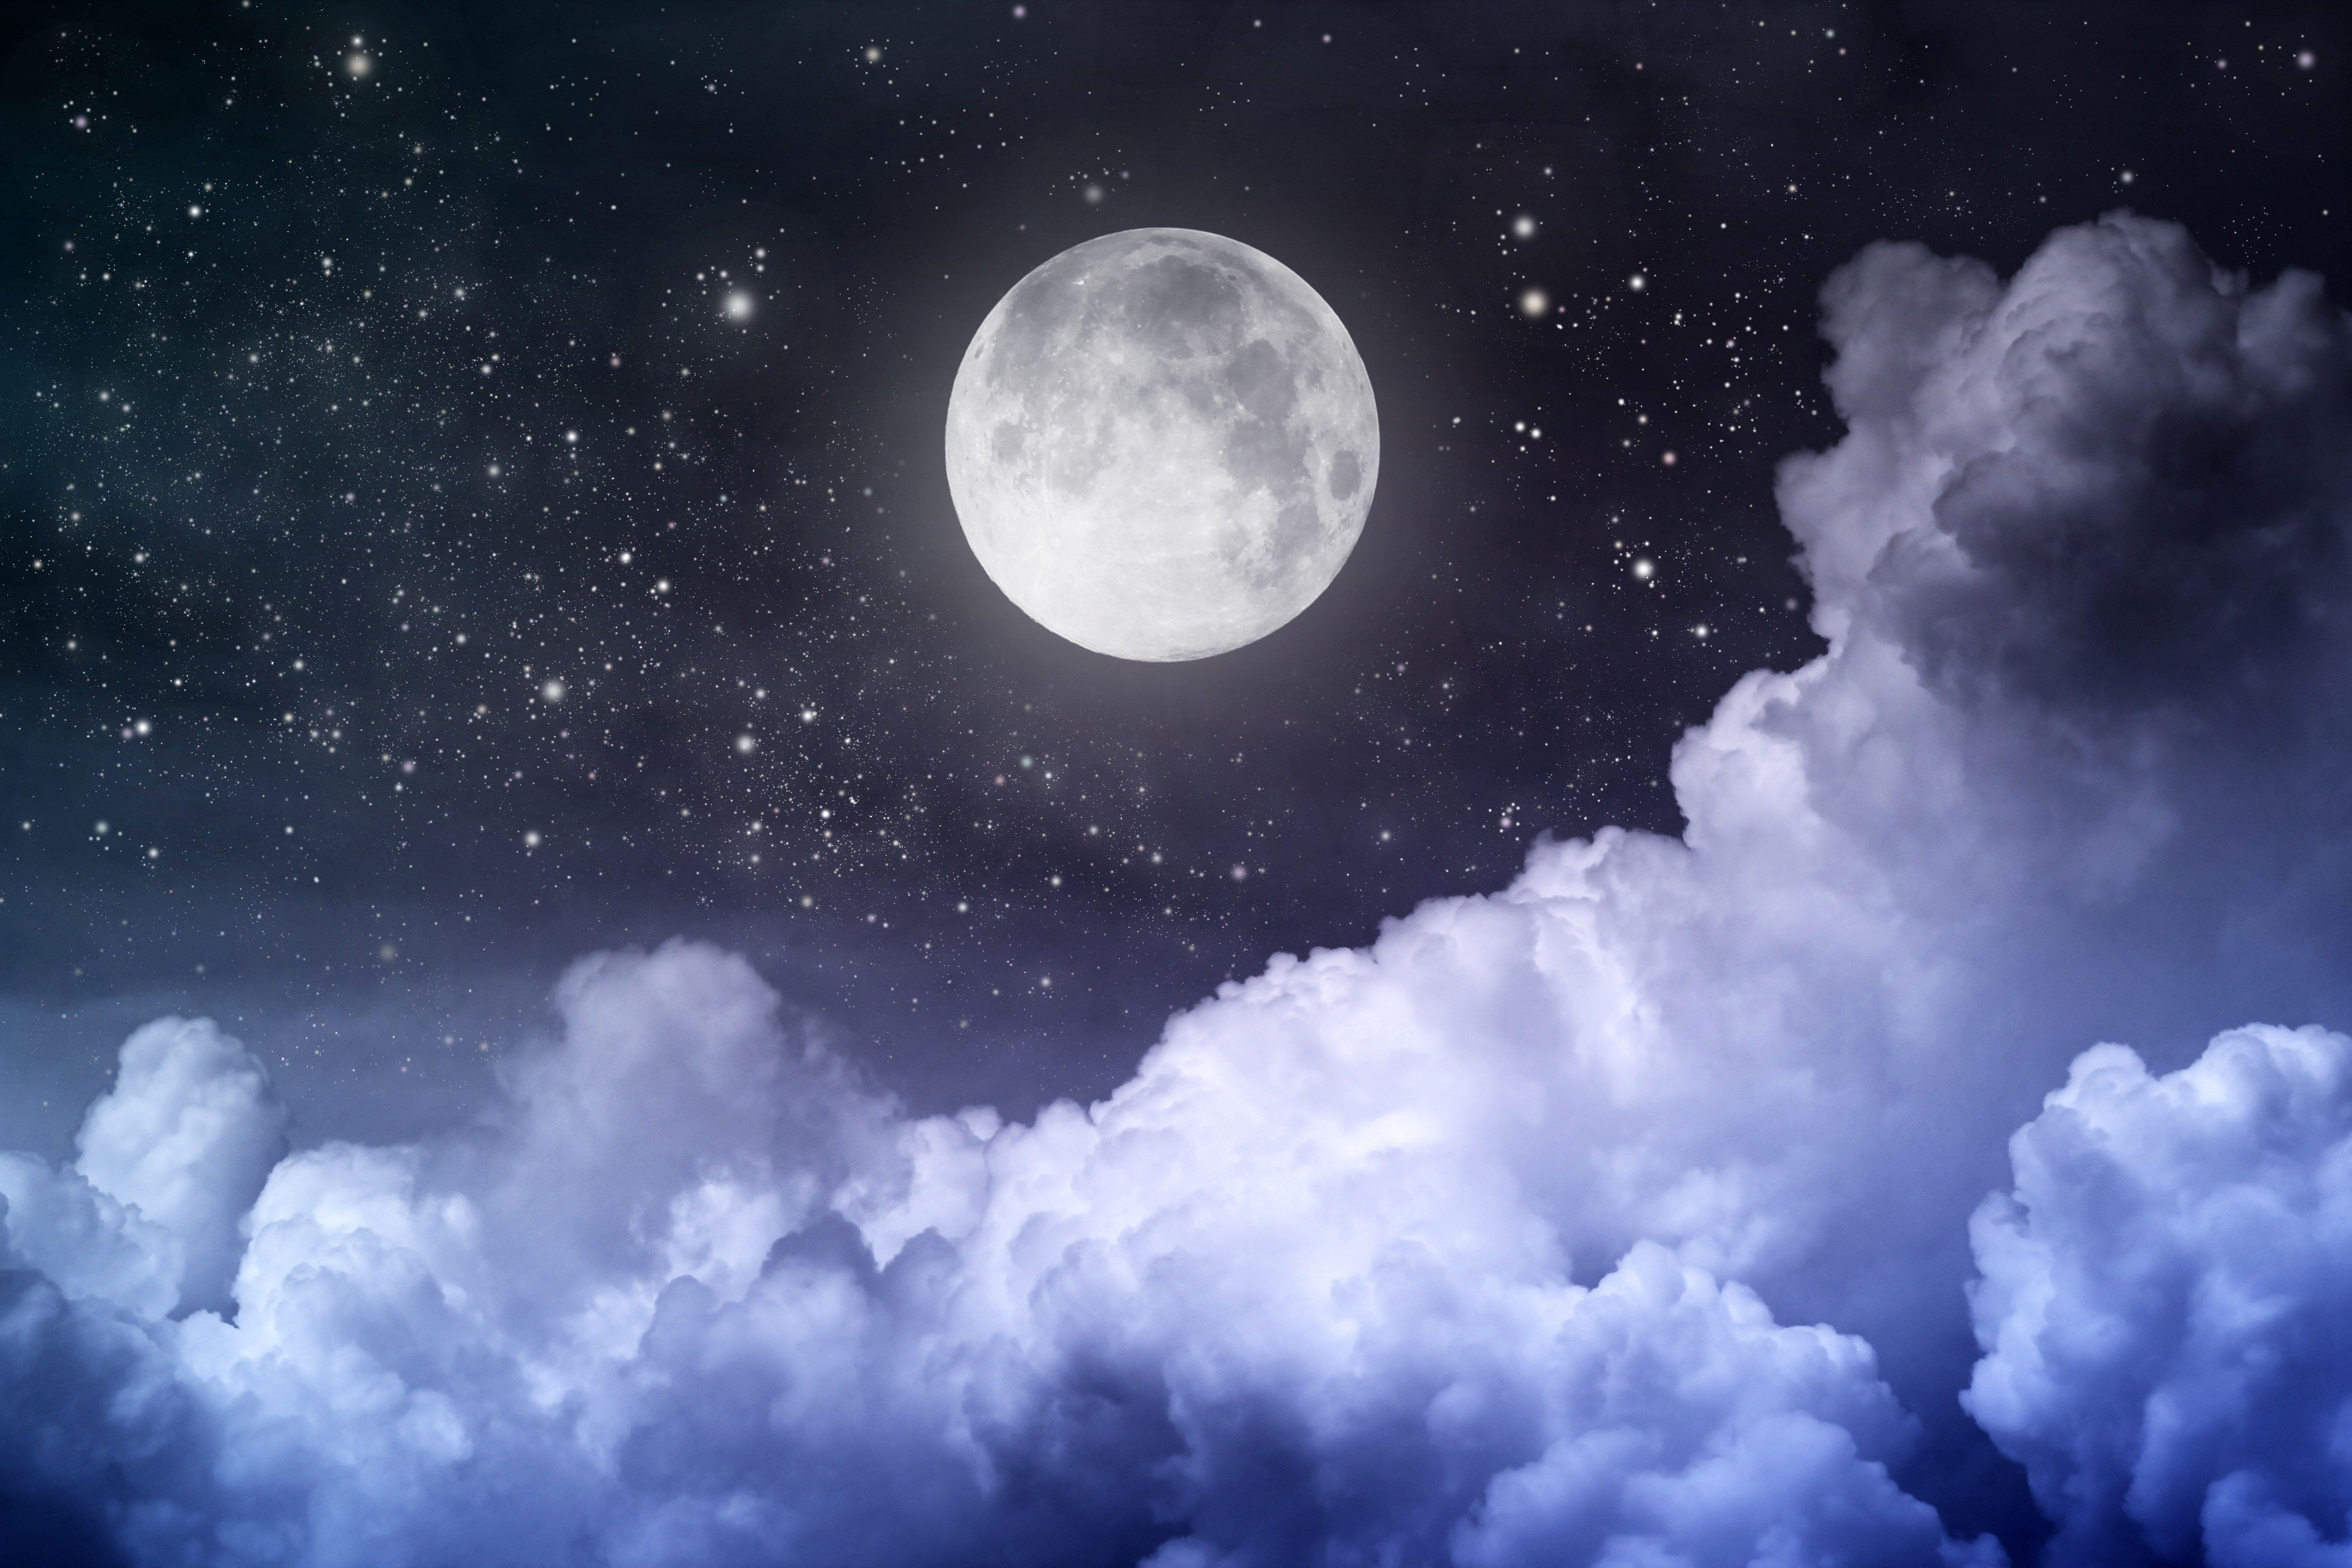 free computer wallpaper for night sky moon, 1792 kB - Reid Sinclair